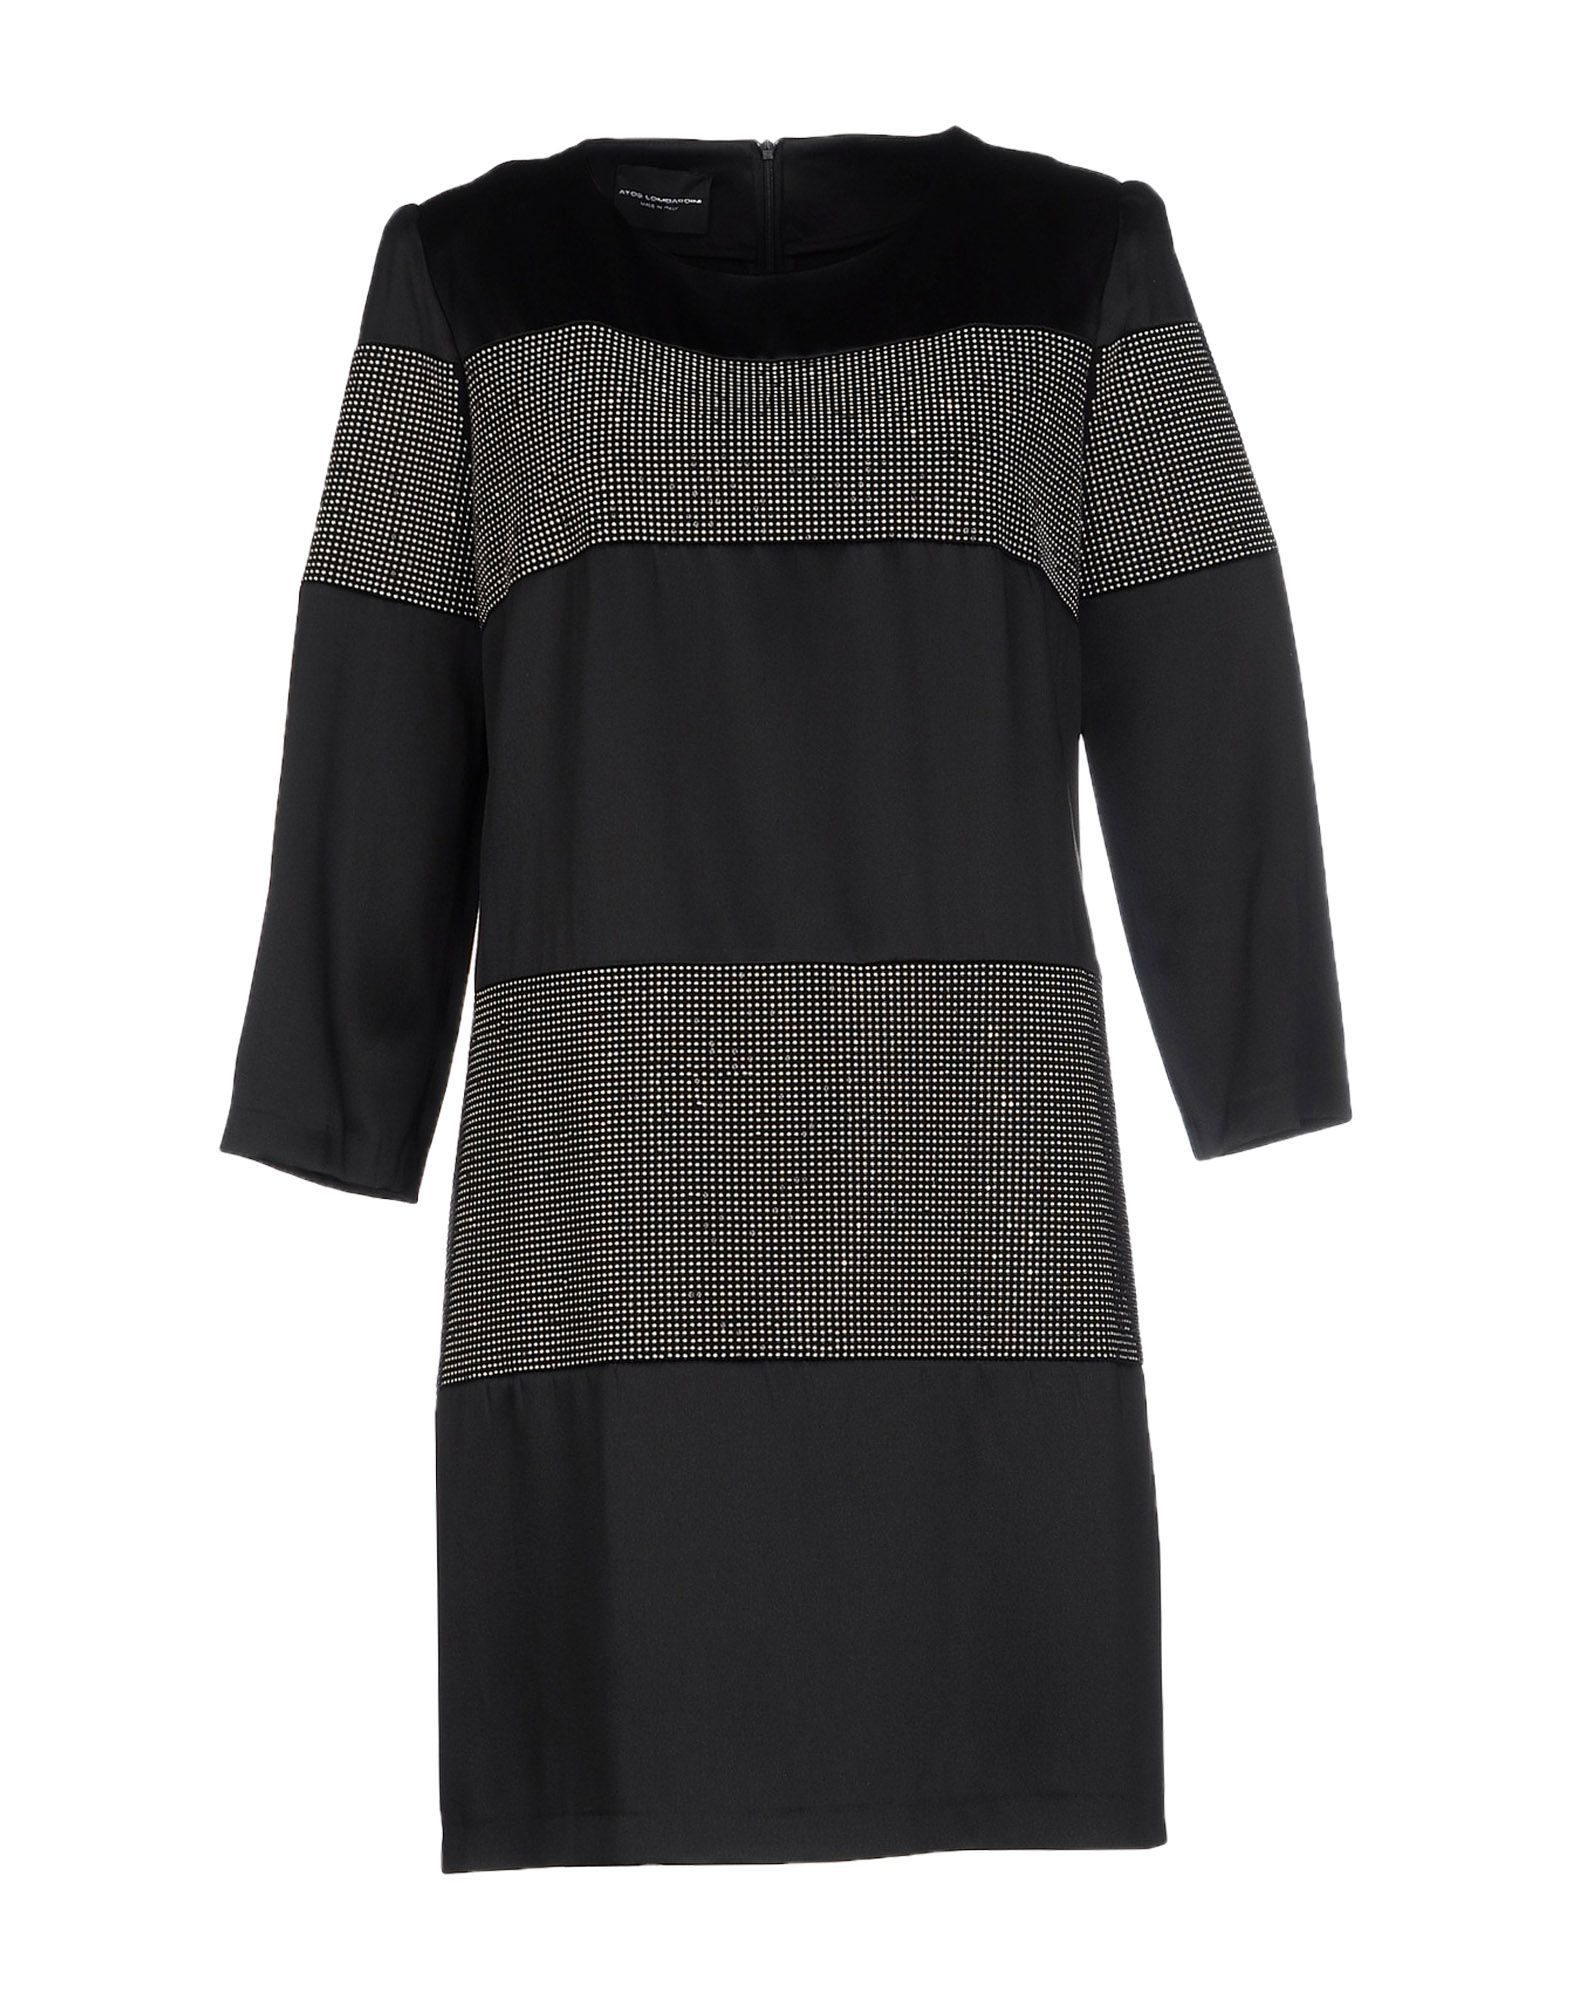 ATOS LOMBARDINI Damen Kurzes Kleid Farbe Schwarz Größe 5